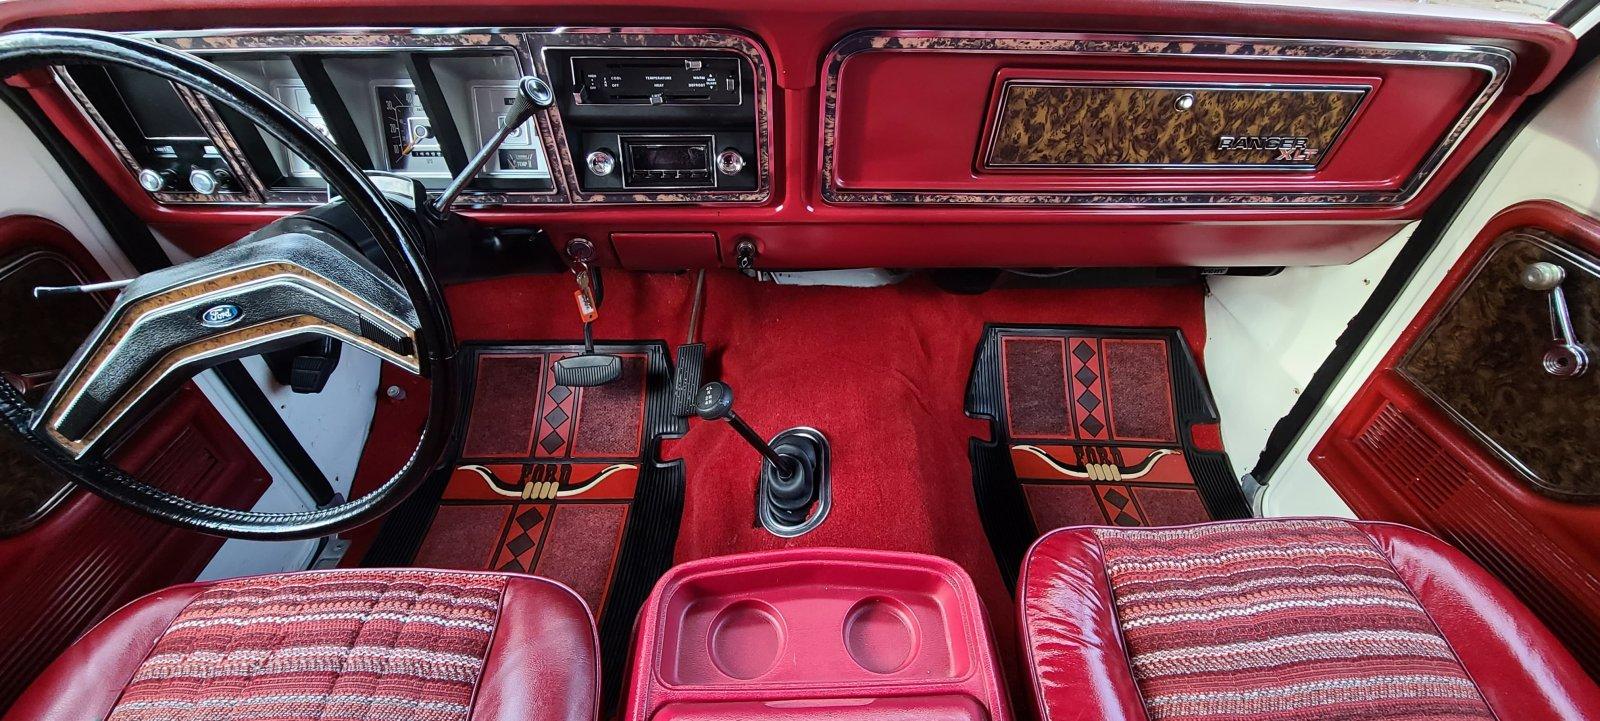 1979 Ford Bronco Ranger XLT Trailer Special - For Sale 4.JPG